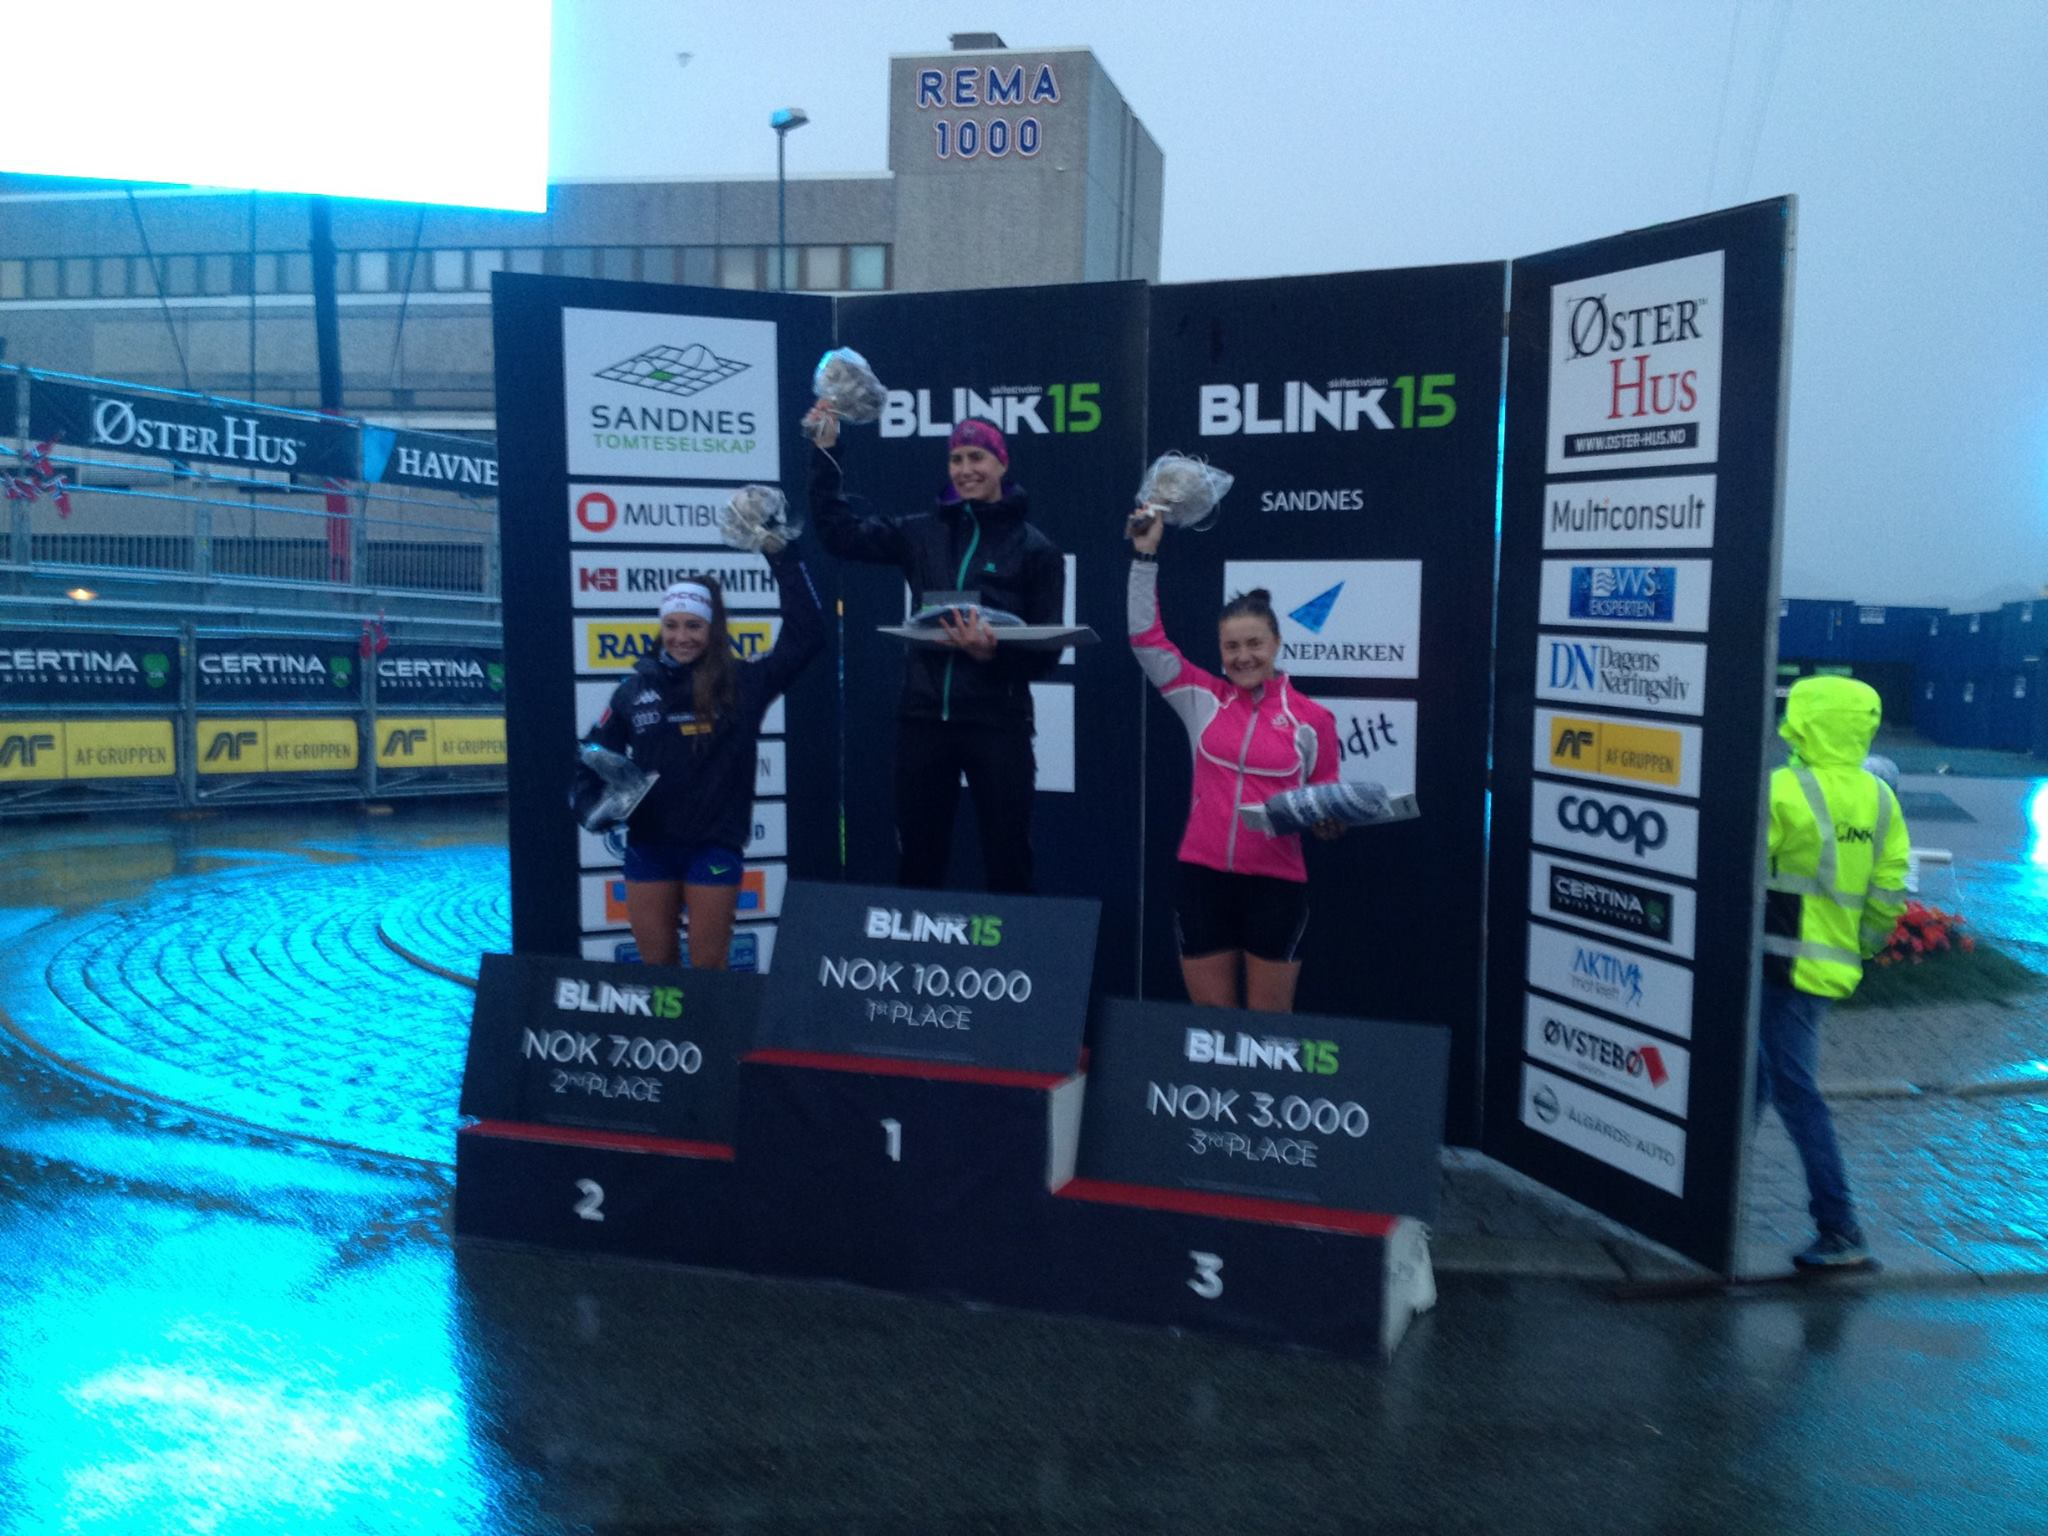 https://fasterskier.com/wp-content/blogs.dir/1/files/2015/08/Blink-podium.jpg